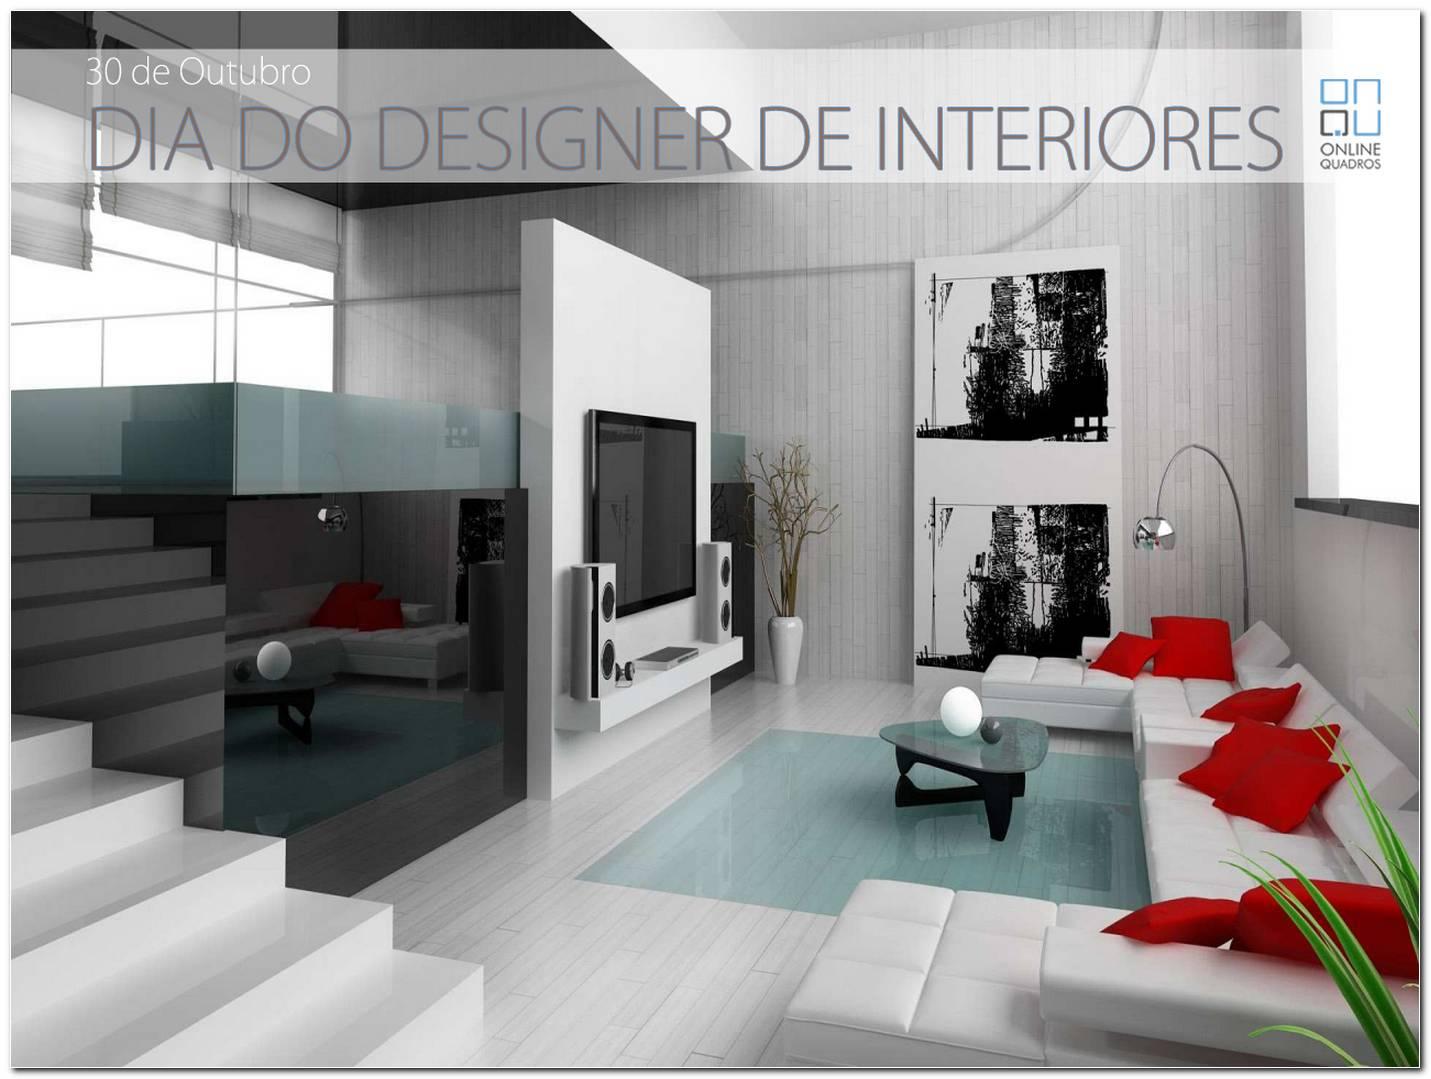 Site De Design De Interiores Online